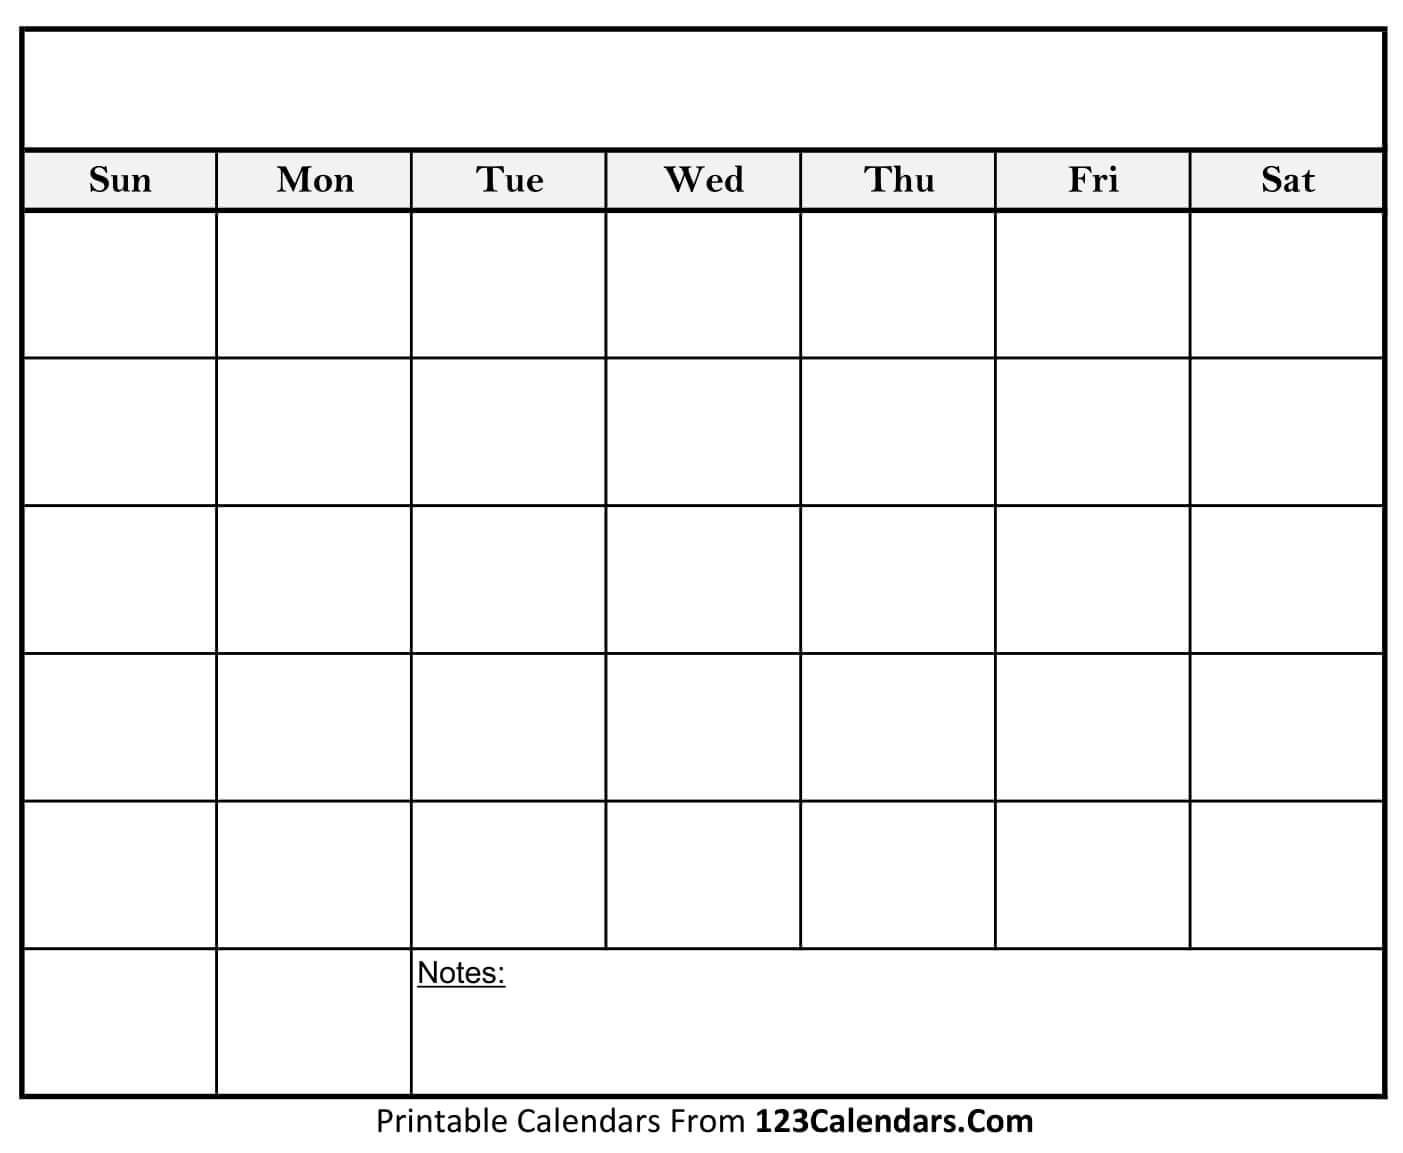 Get Blank Printable Calendar